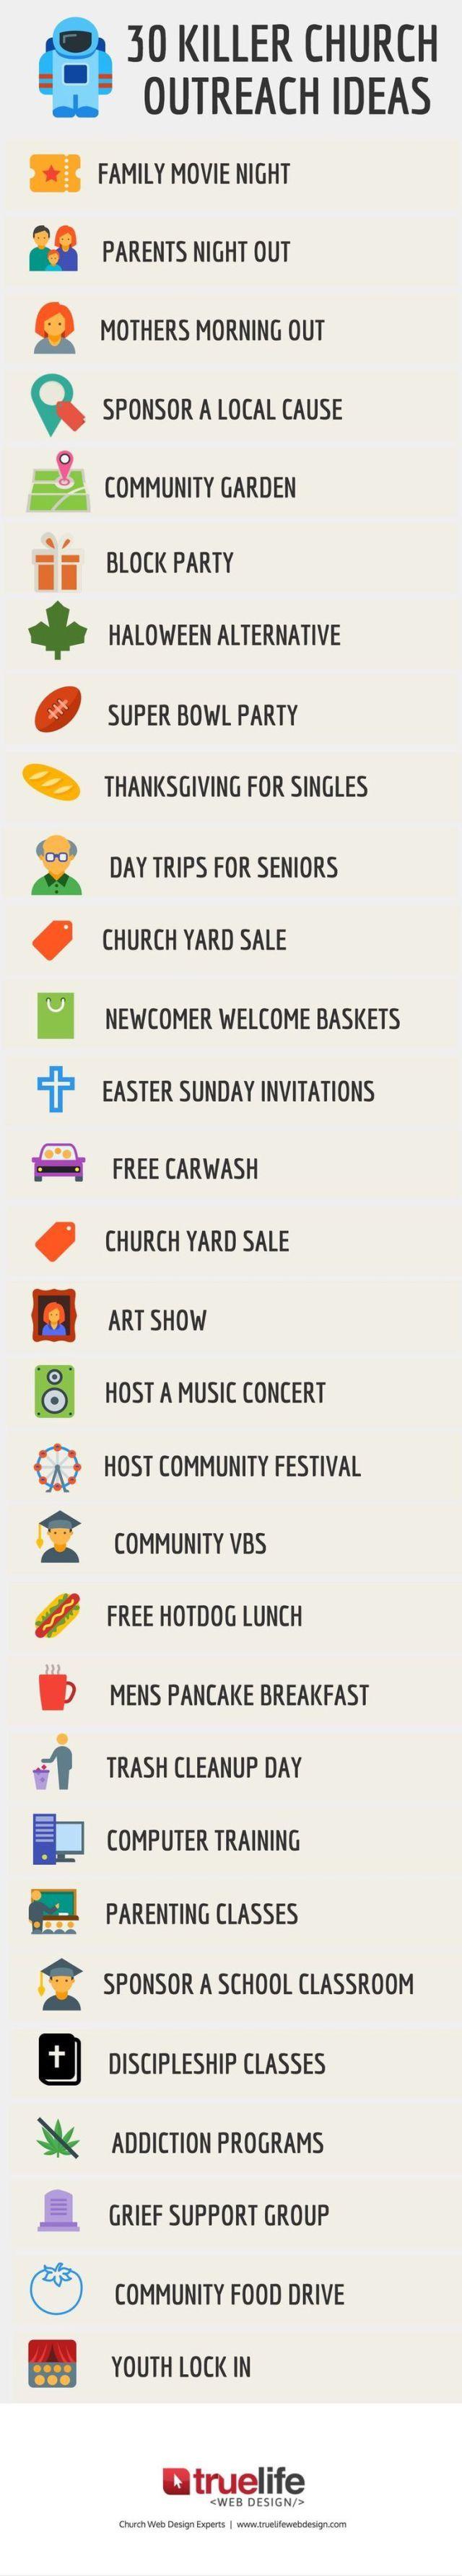 Church christmas programs - Fundraising Infographic Outreach Ideas